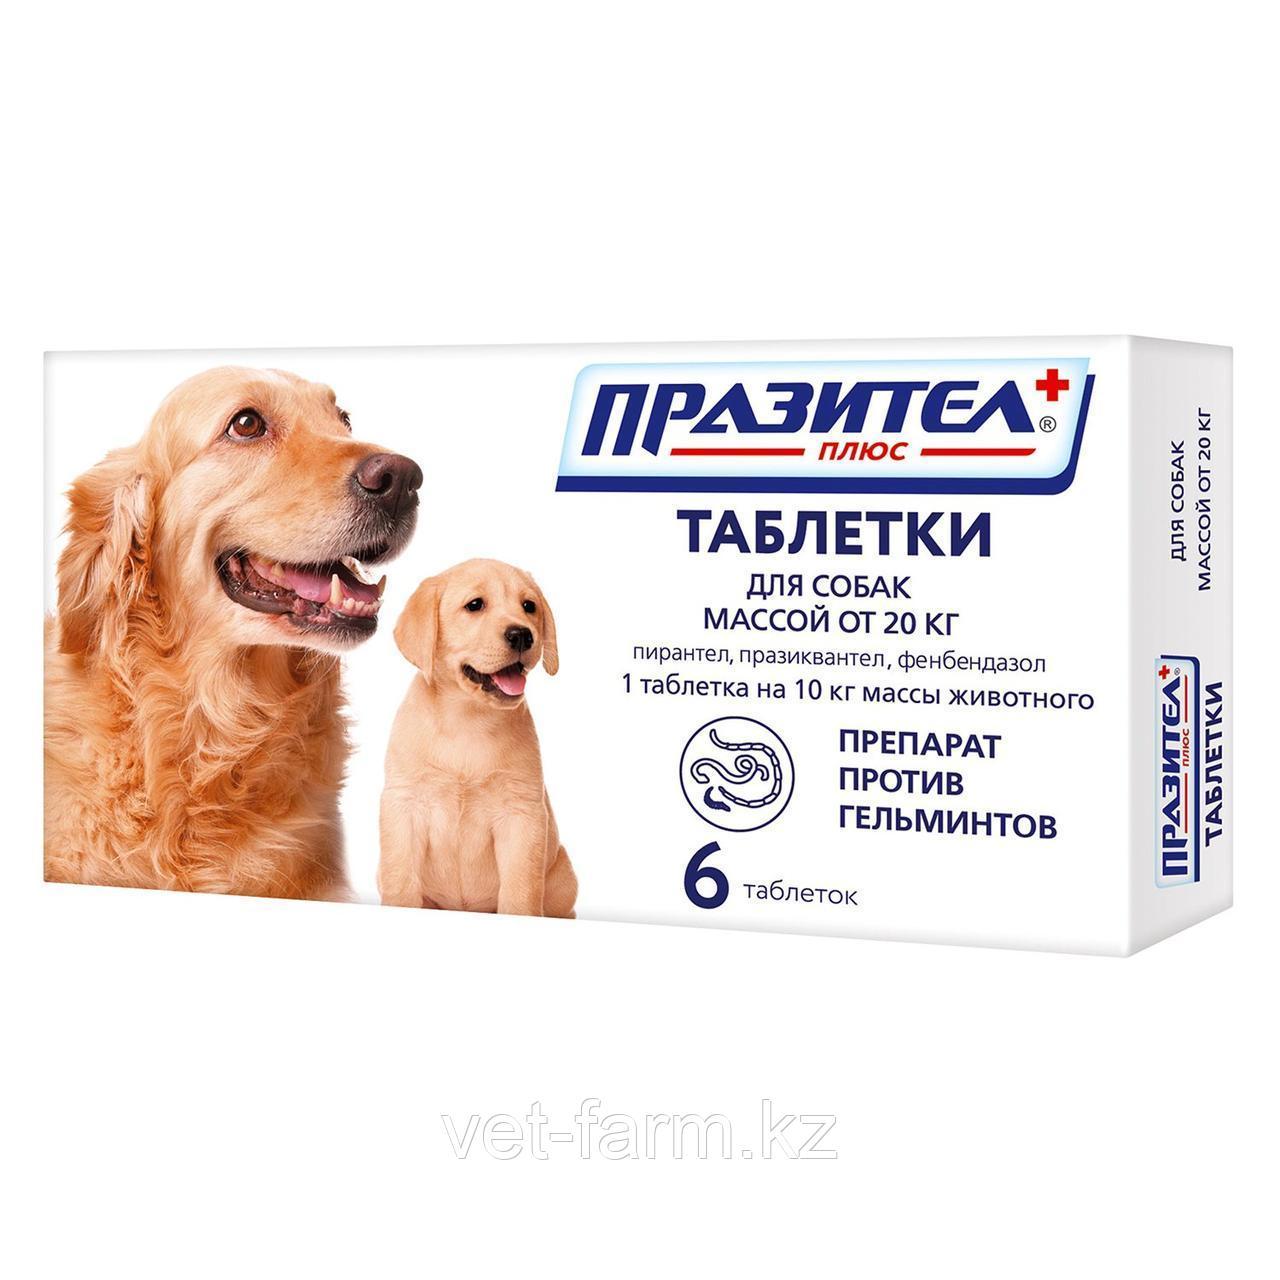 Празител таблетки для собак